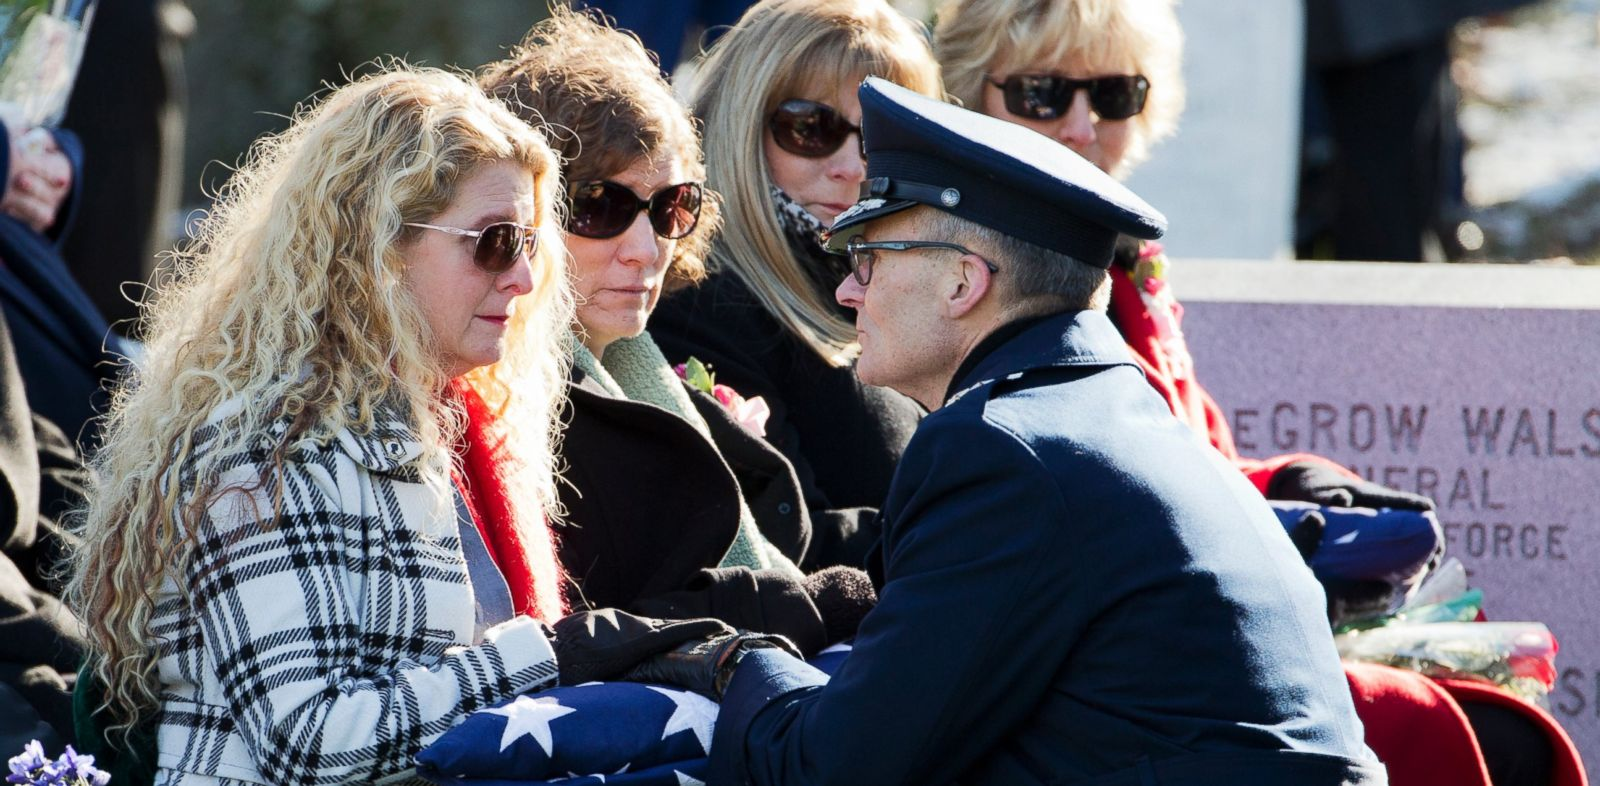 PHOTO: Maj. Gen. Steven Lepper, front right, consoles the family of U.S. Air Force Col. Francis McGouldrick Jr., from left, Marri Petrucci, Melisa Hill, Megan Genheimer, Michele Guess.